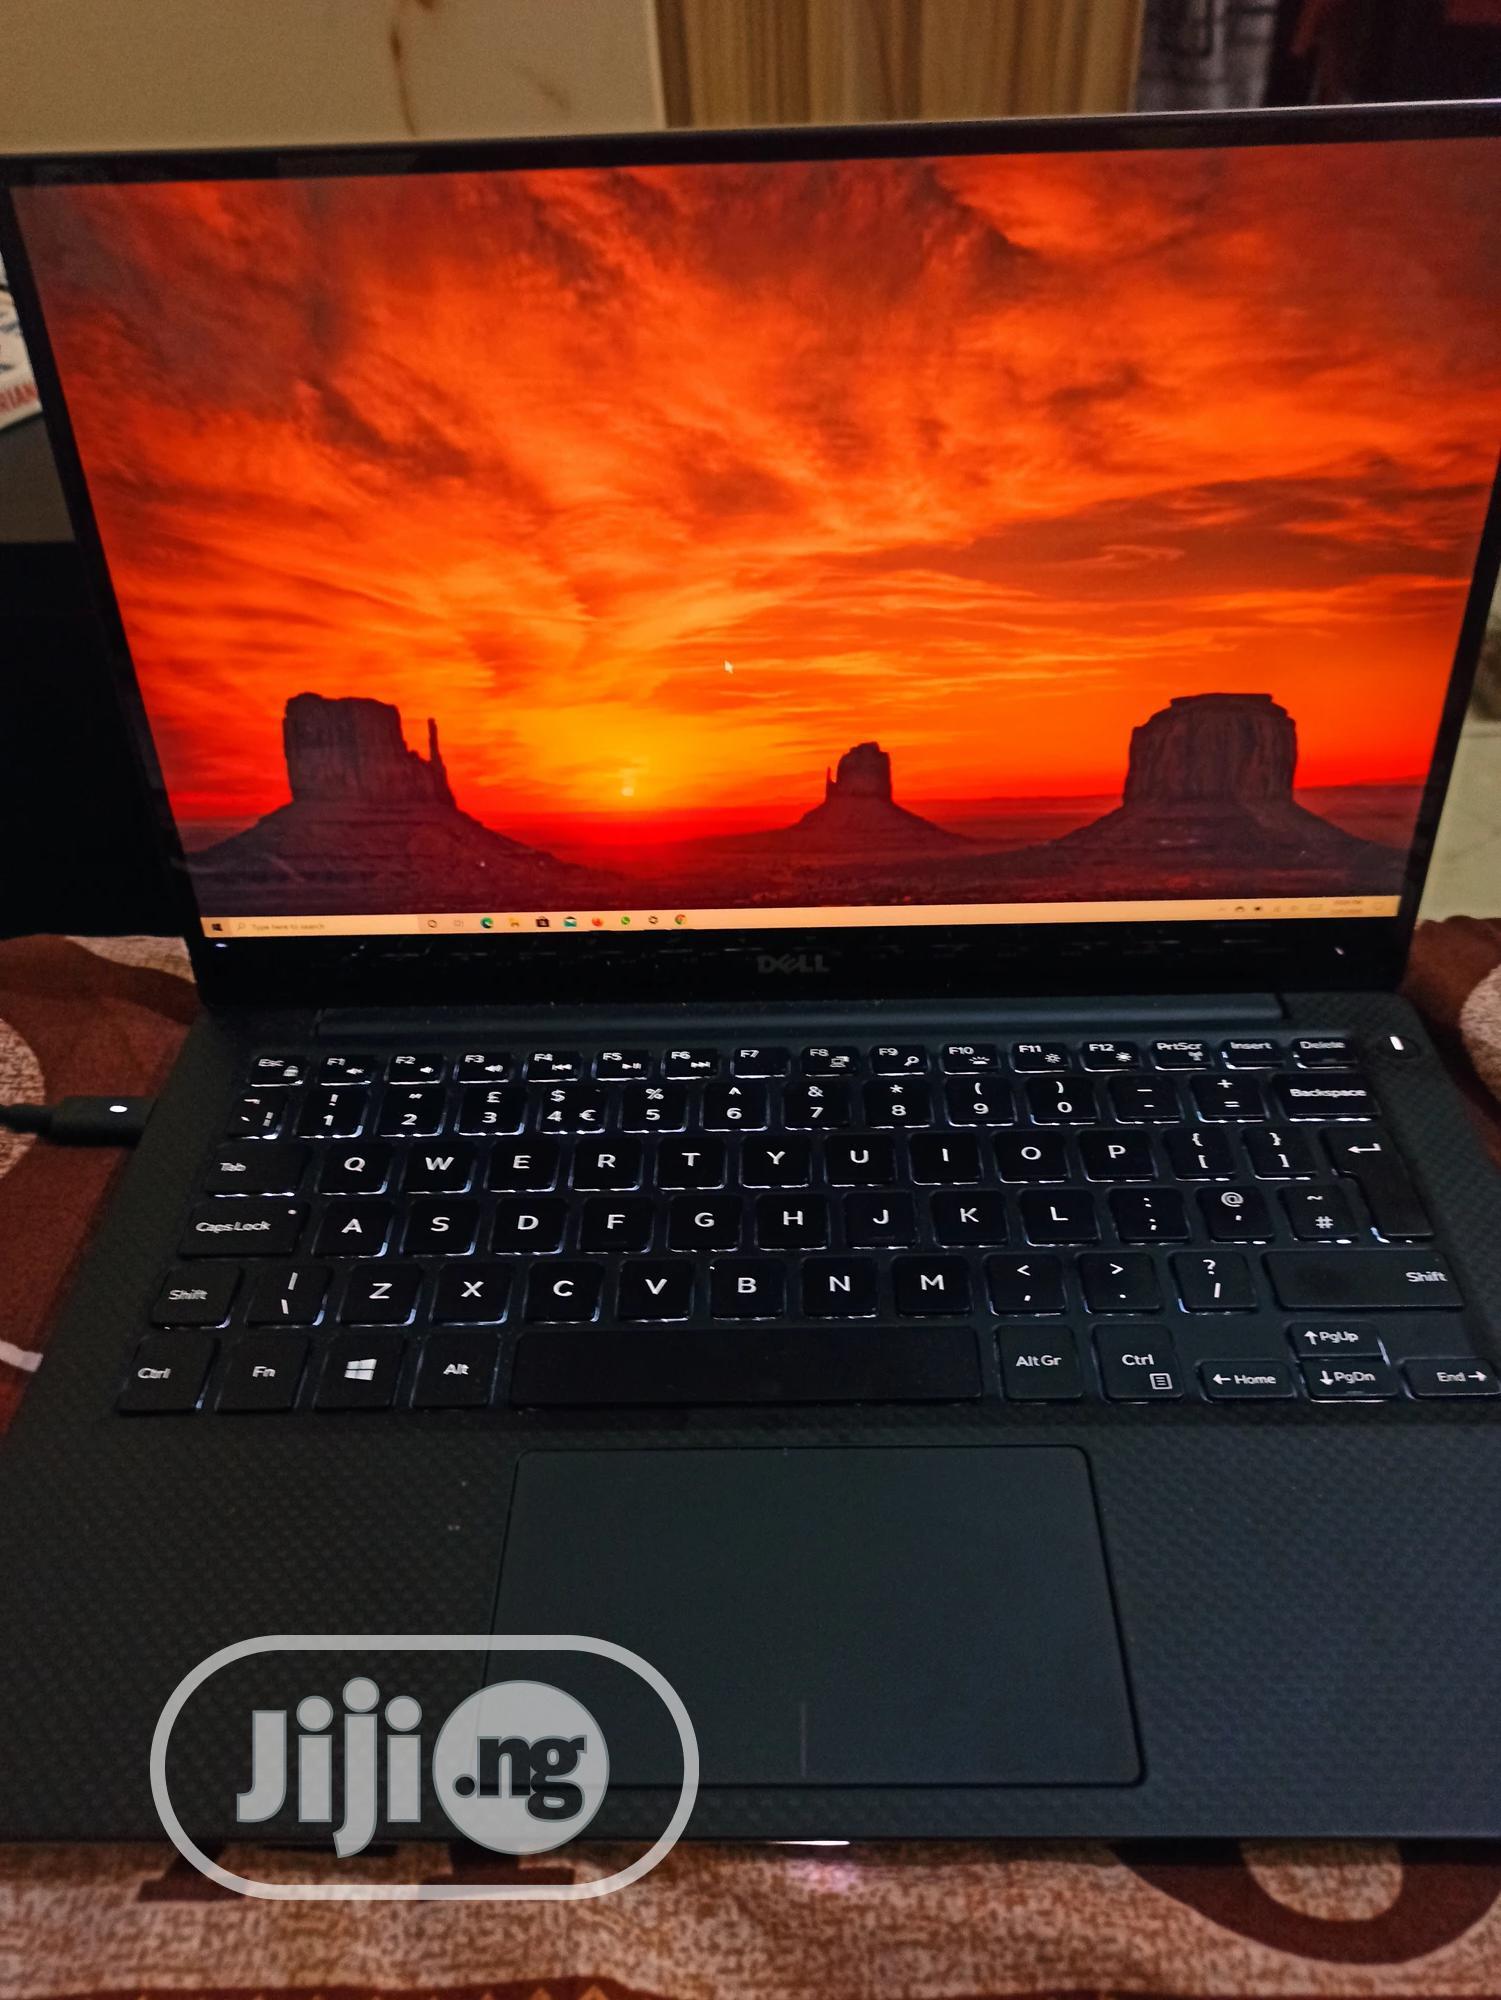 Archive: Laptop Dell XPS 13 (9350) 16GB Intel Core I7 SSD 256GB